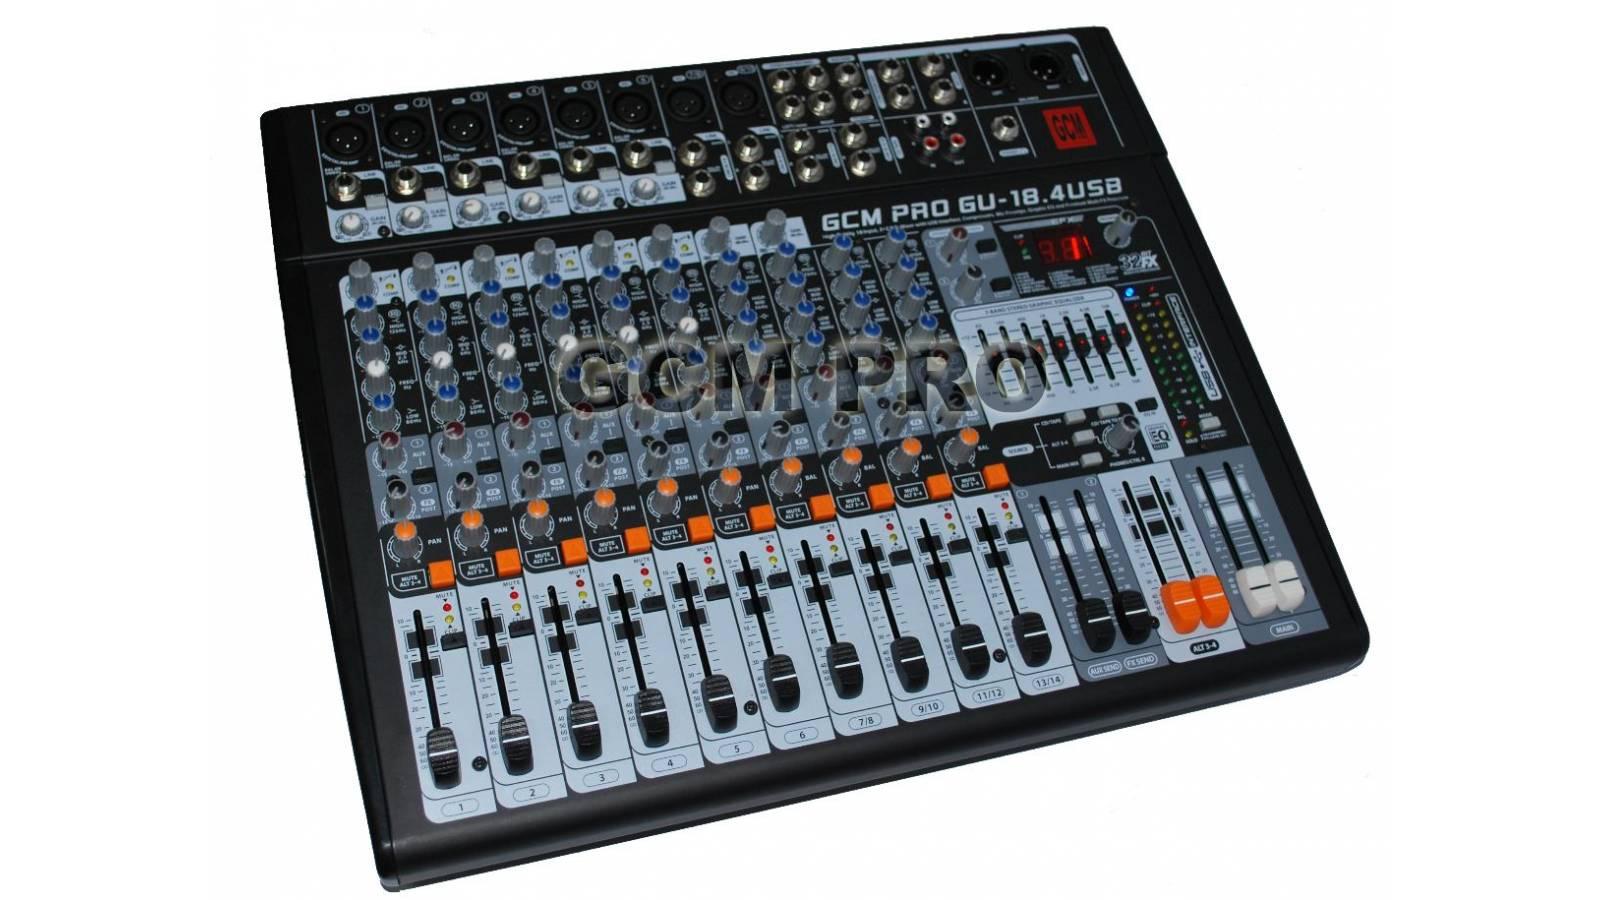 Consola 14 Canales Con Usb Gu18.4 Gcm Pro